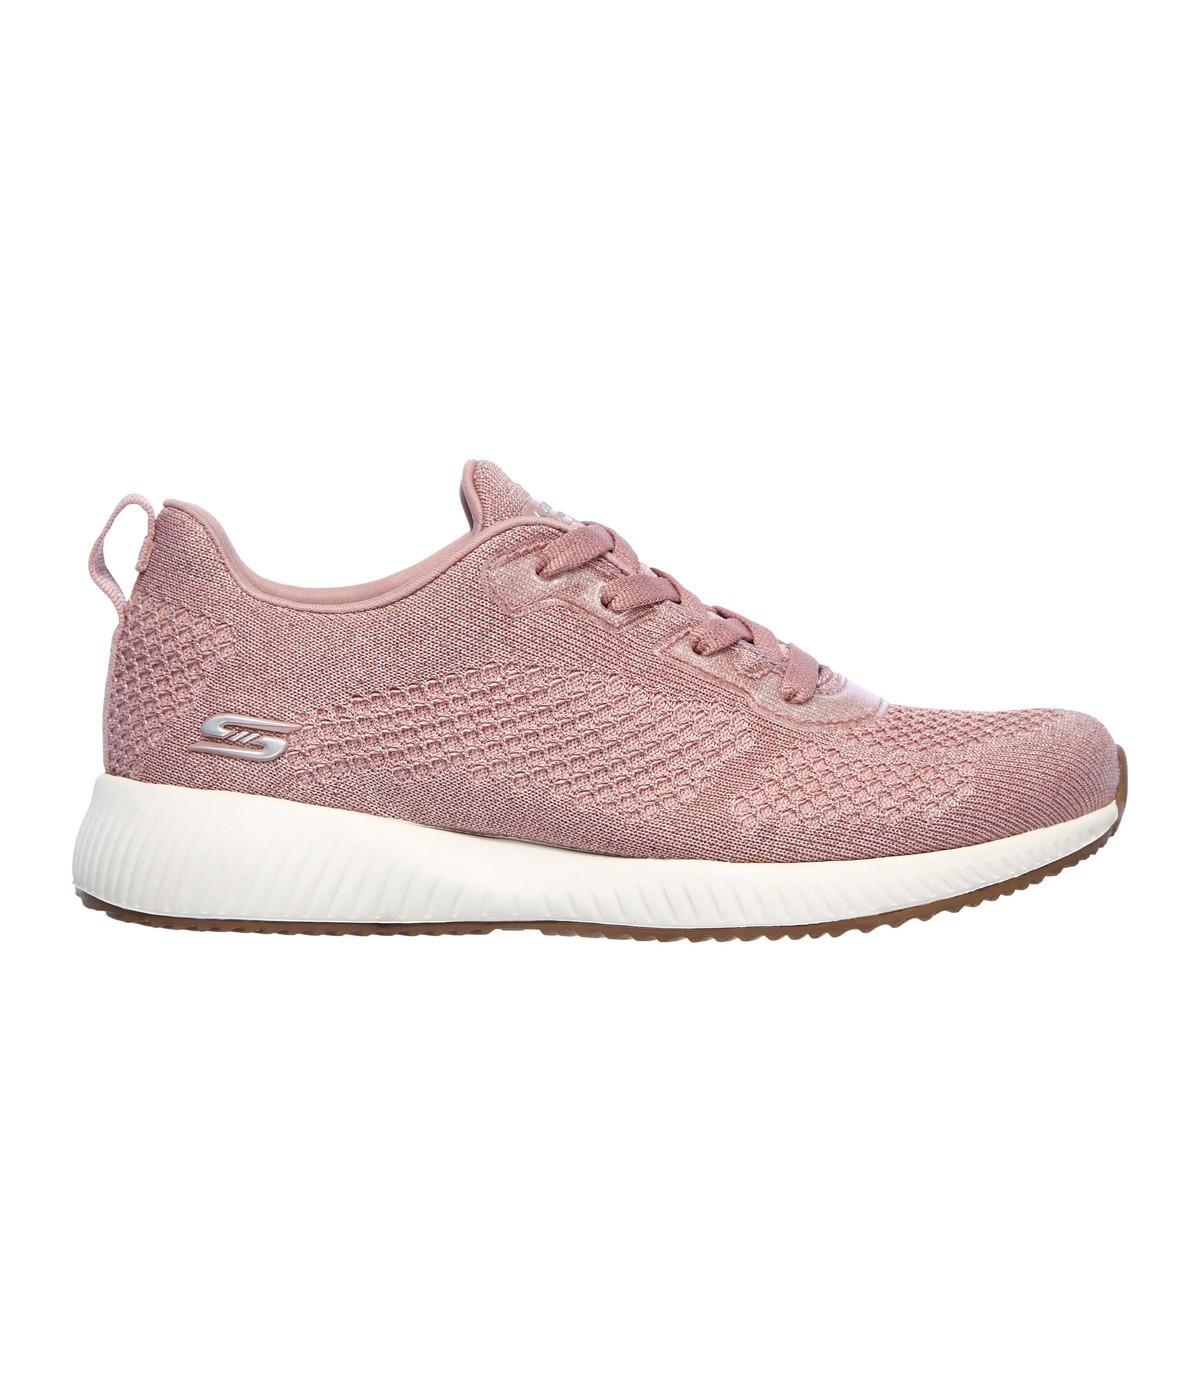 PUMA Basket Heart Copper 365463-01, Sneakers Basses Femme